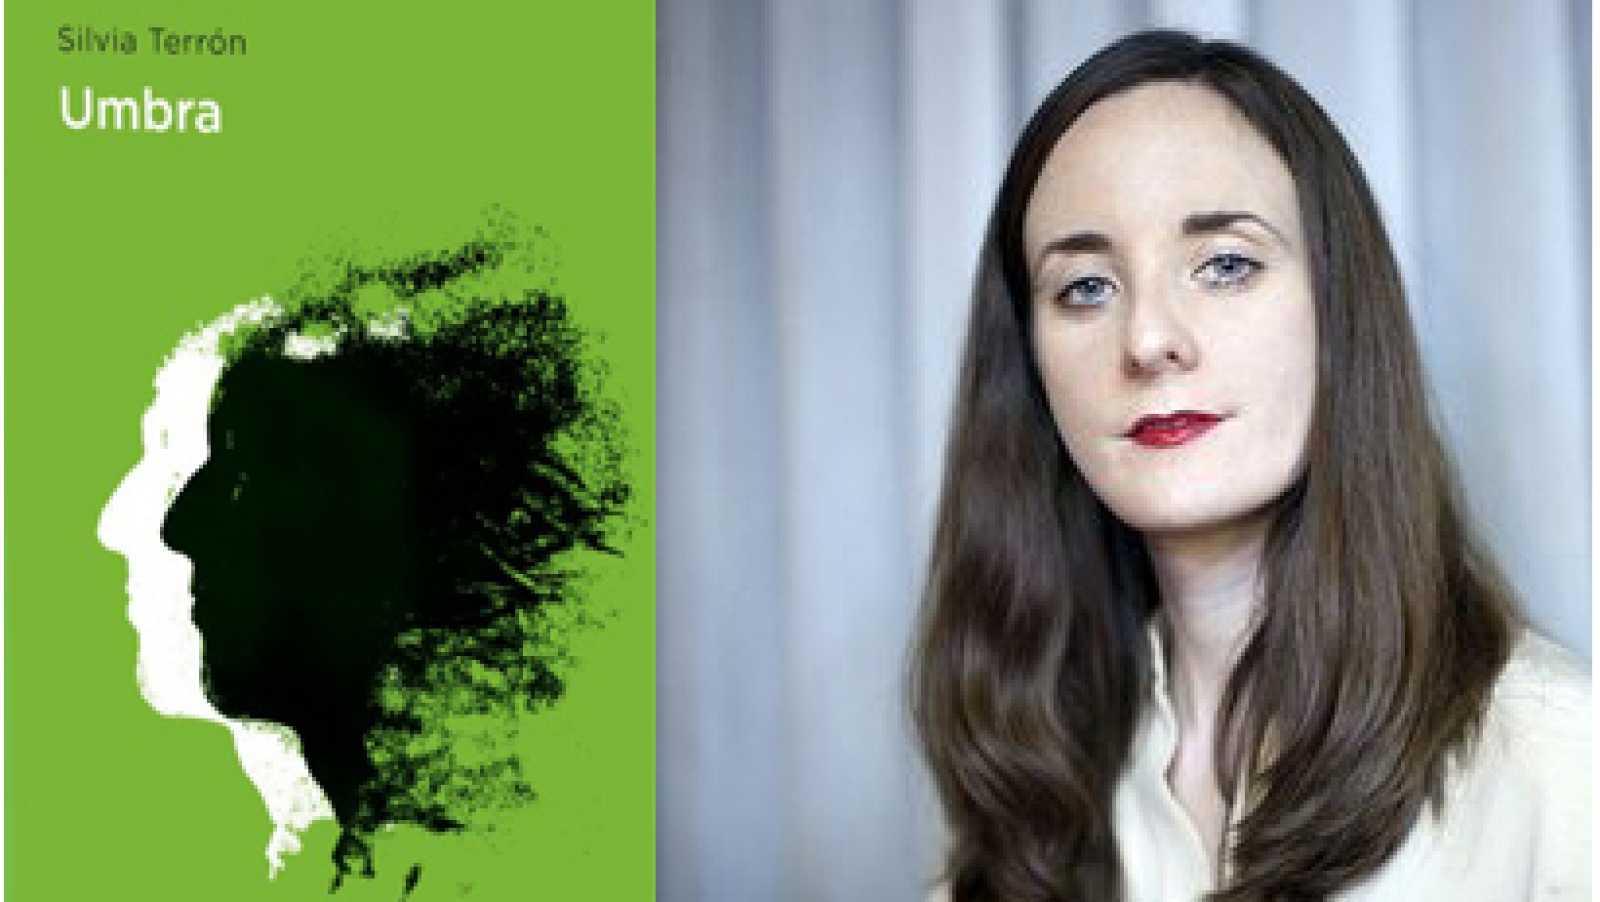 Artesfera - Umbra, primera novela de Silvia Terrón - 24/10/18 - escuchar ahora